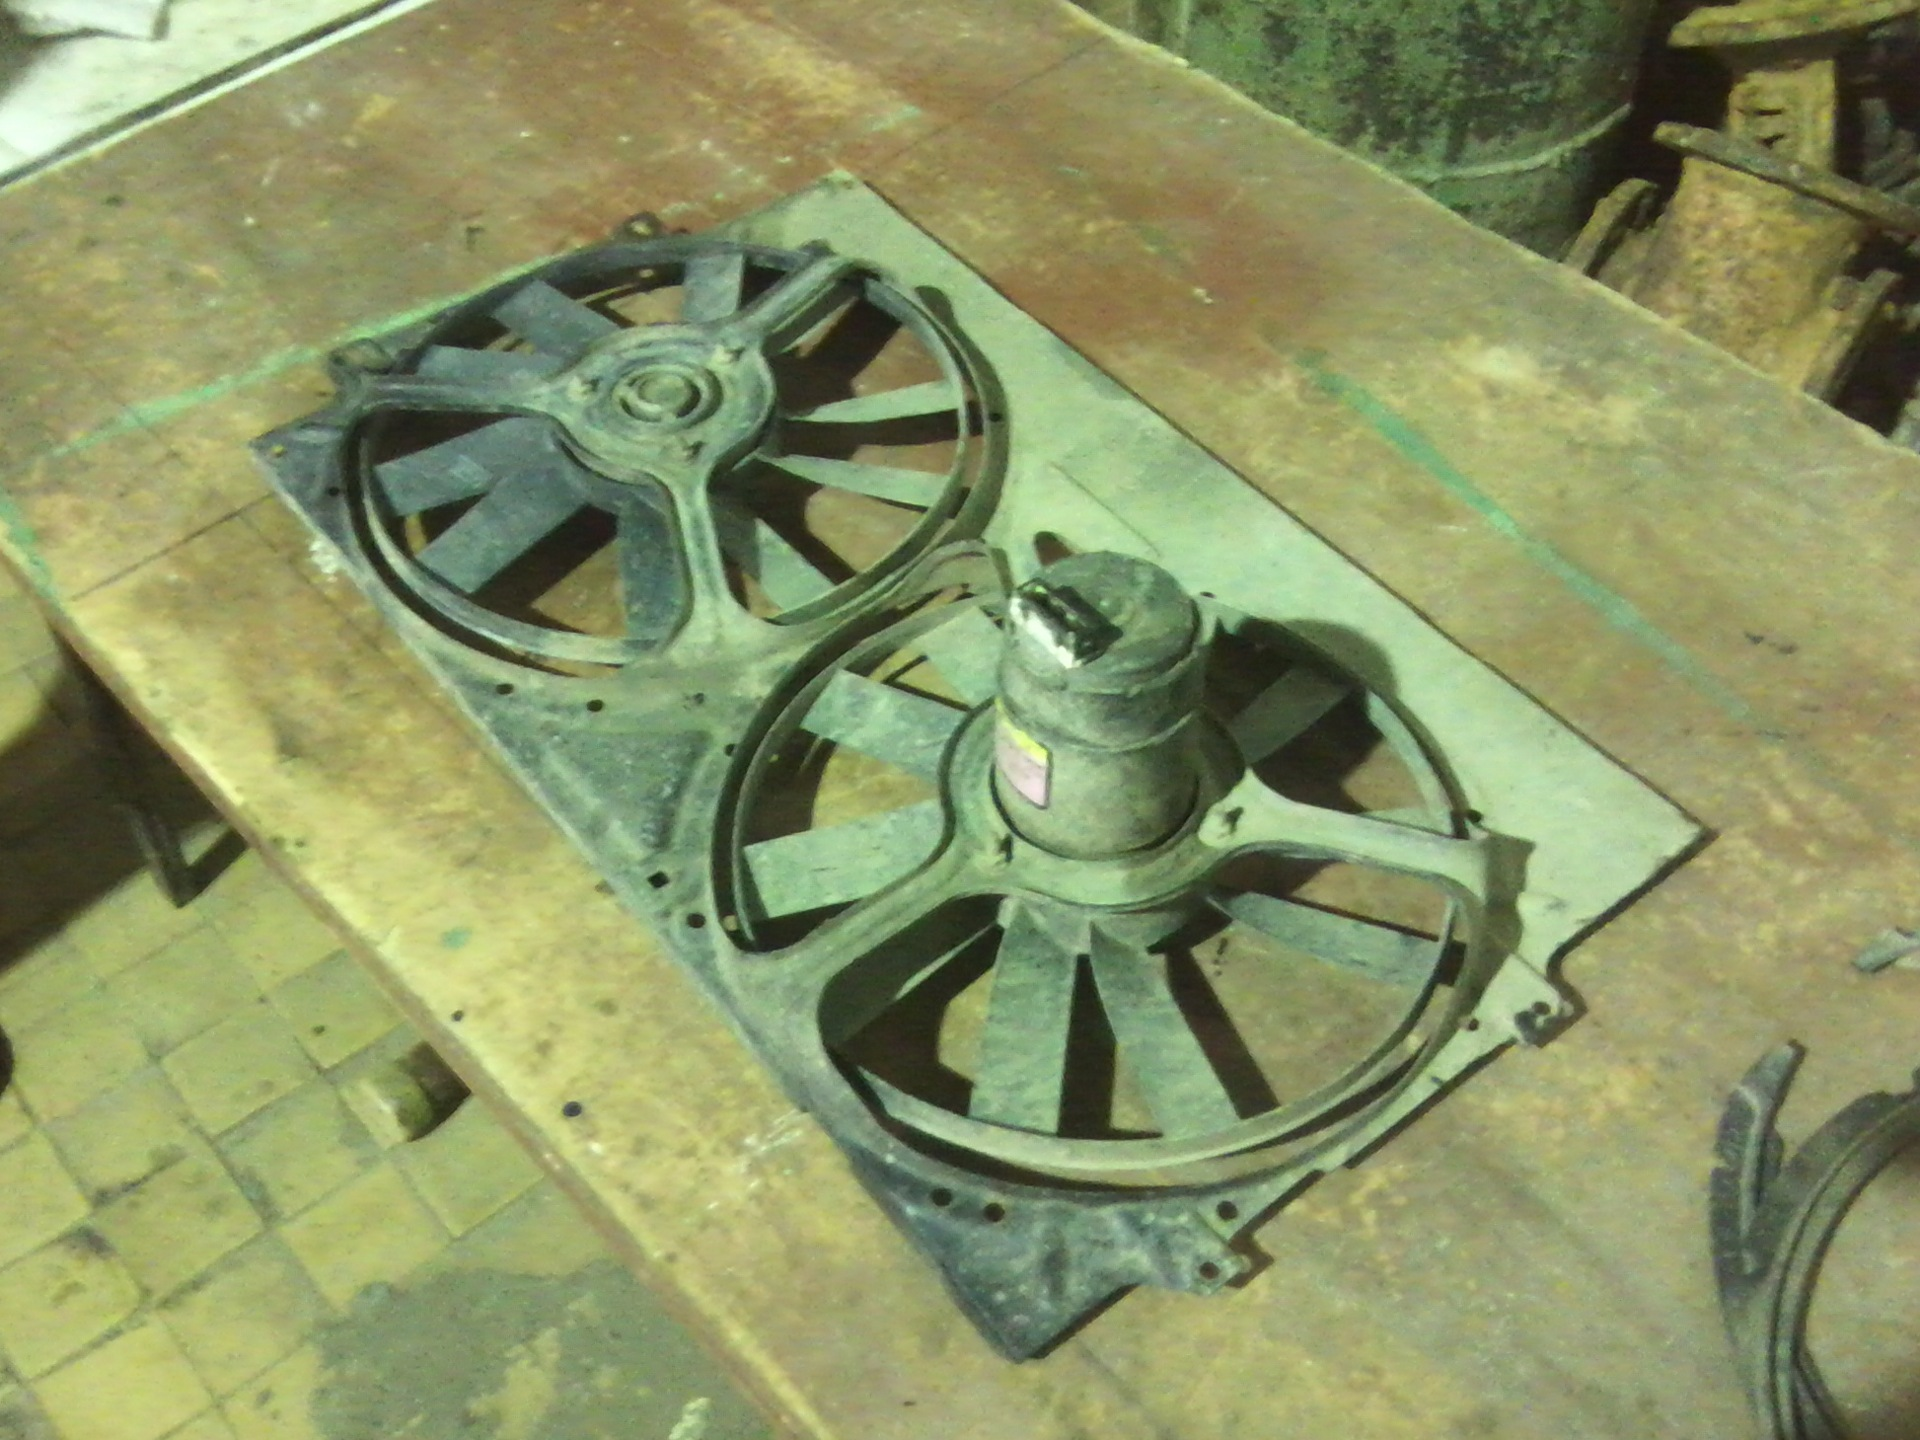 Ремонт моторчика вентилятора охлаждения т5 Замена ролика натяжителя ремня генератора гранд витара